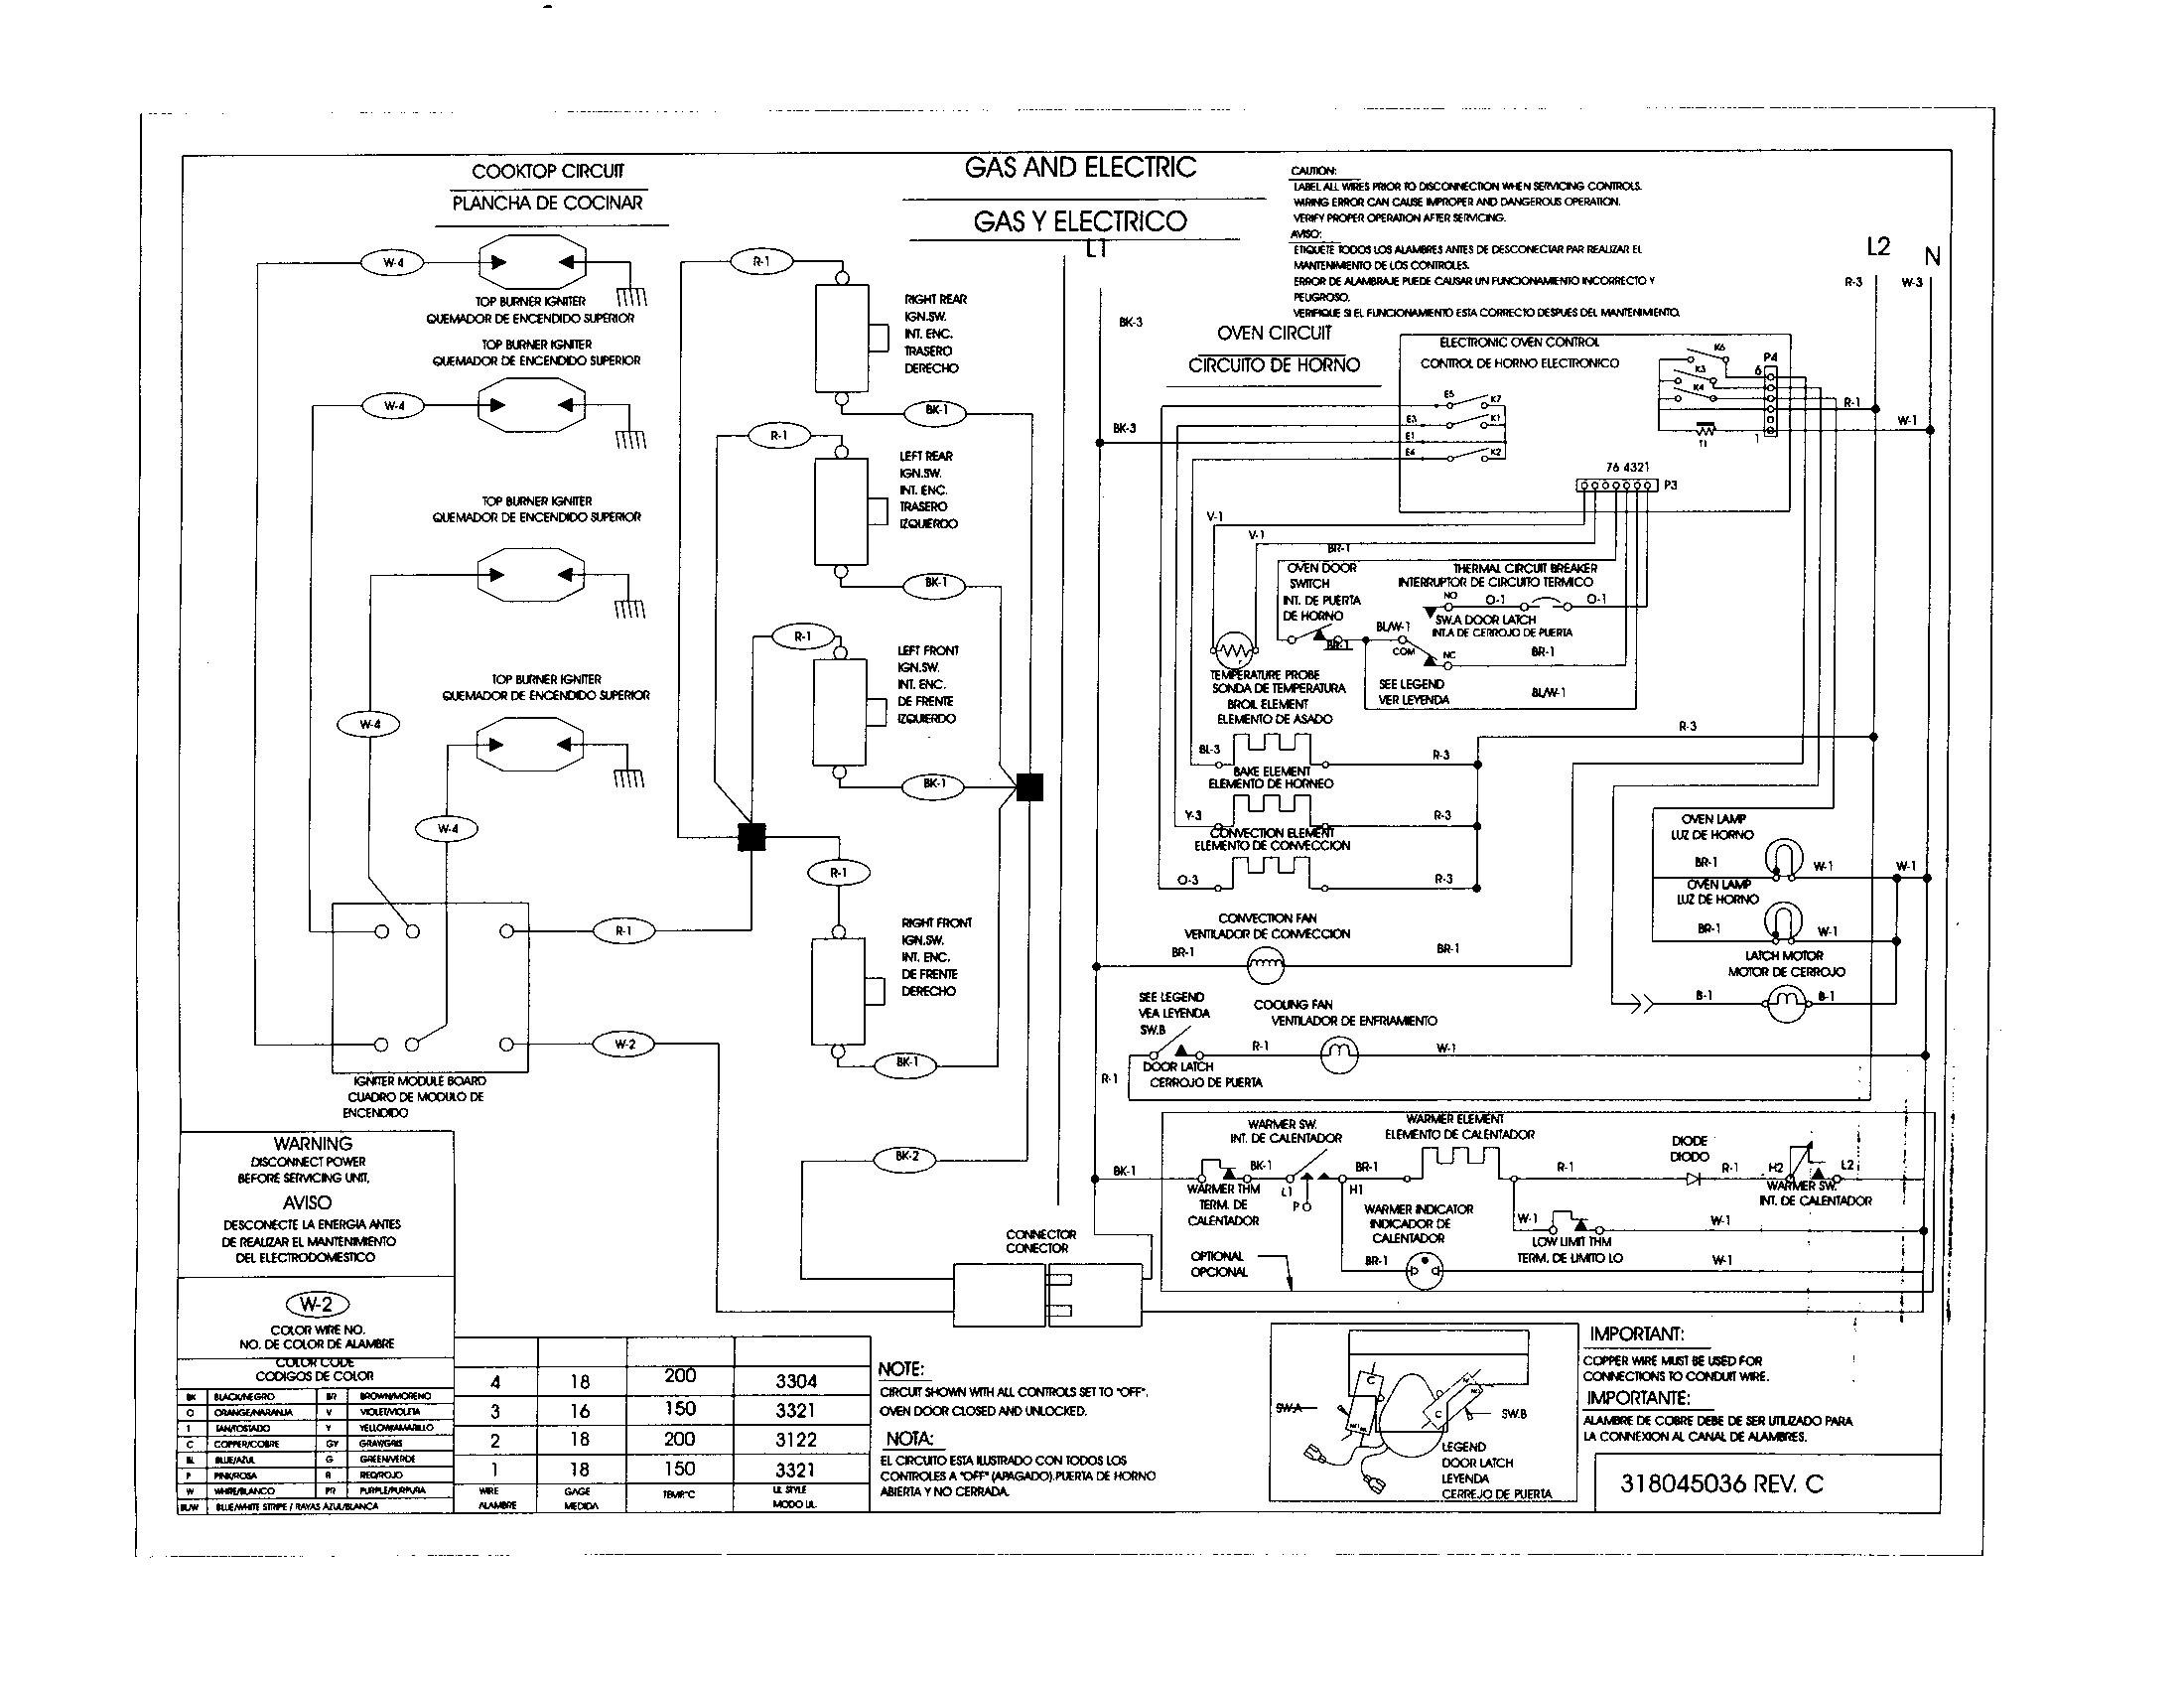 Wolf Range Wiring Diagram - Cat 3406e Ecm Wiring Diagram | Bege Wiring  Diagram | Wolf Range Wiring Diagram |  | Bege Wiring Diagram